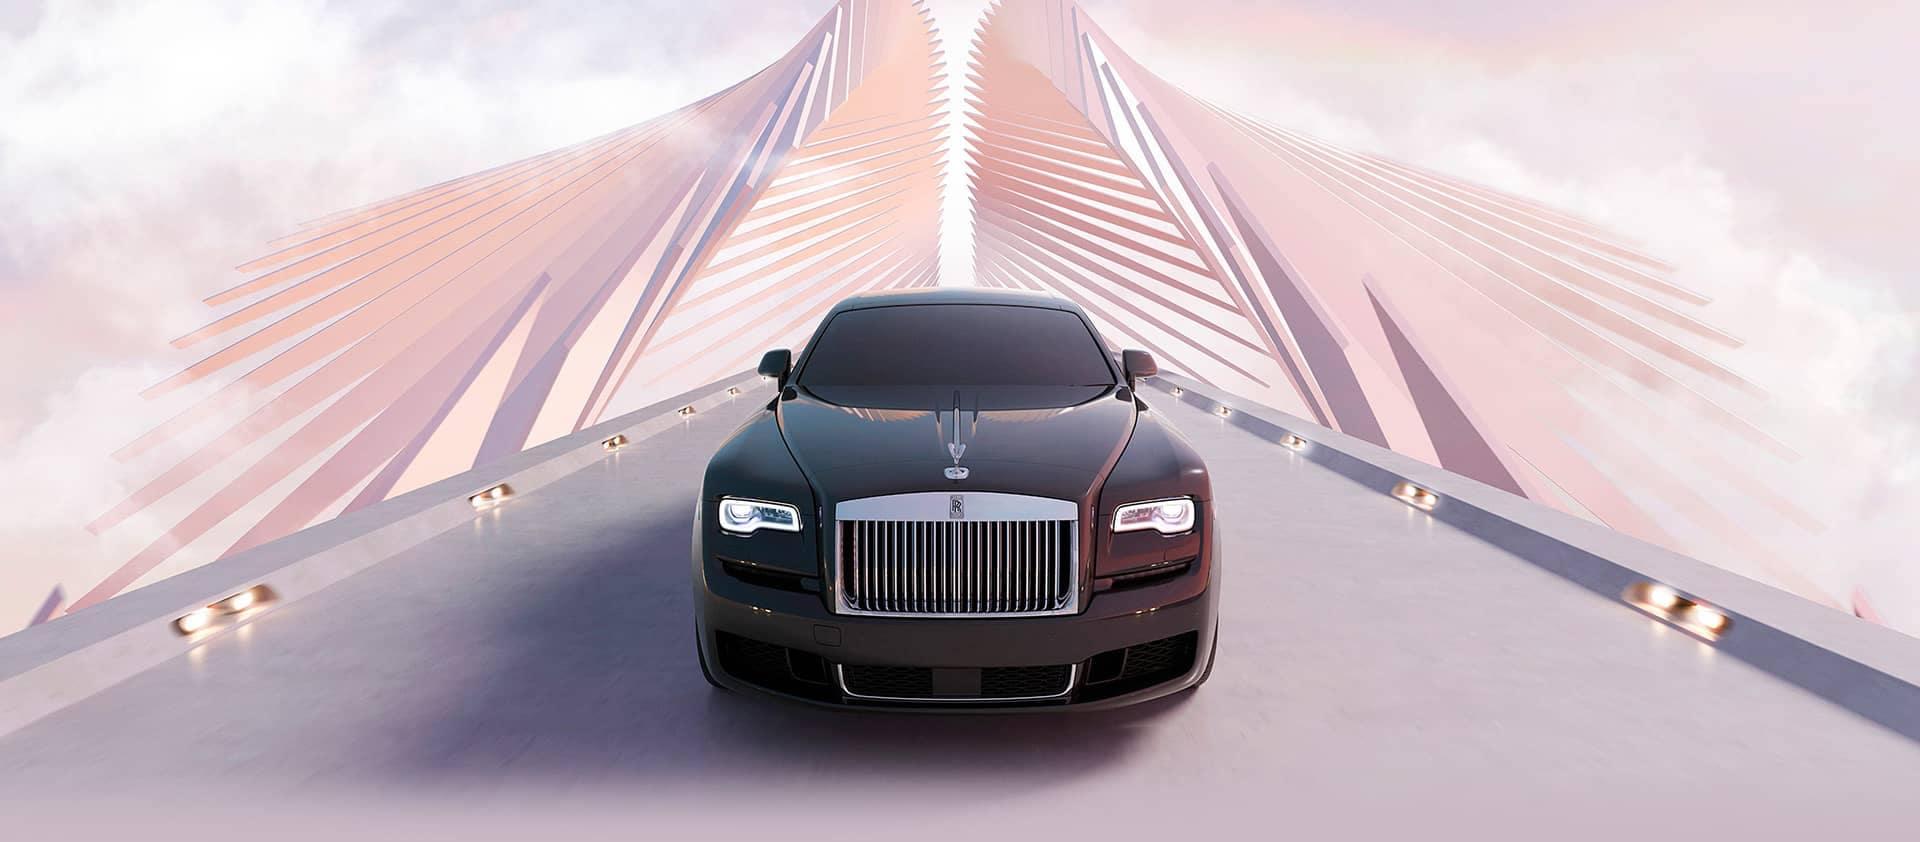 2020 Rolls Royce Ghost Grill